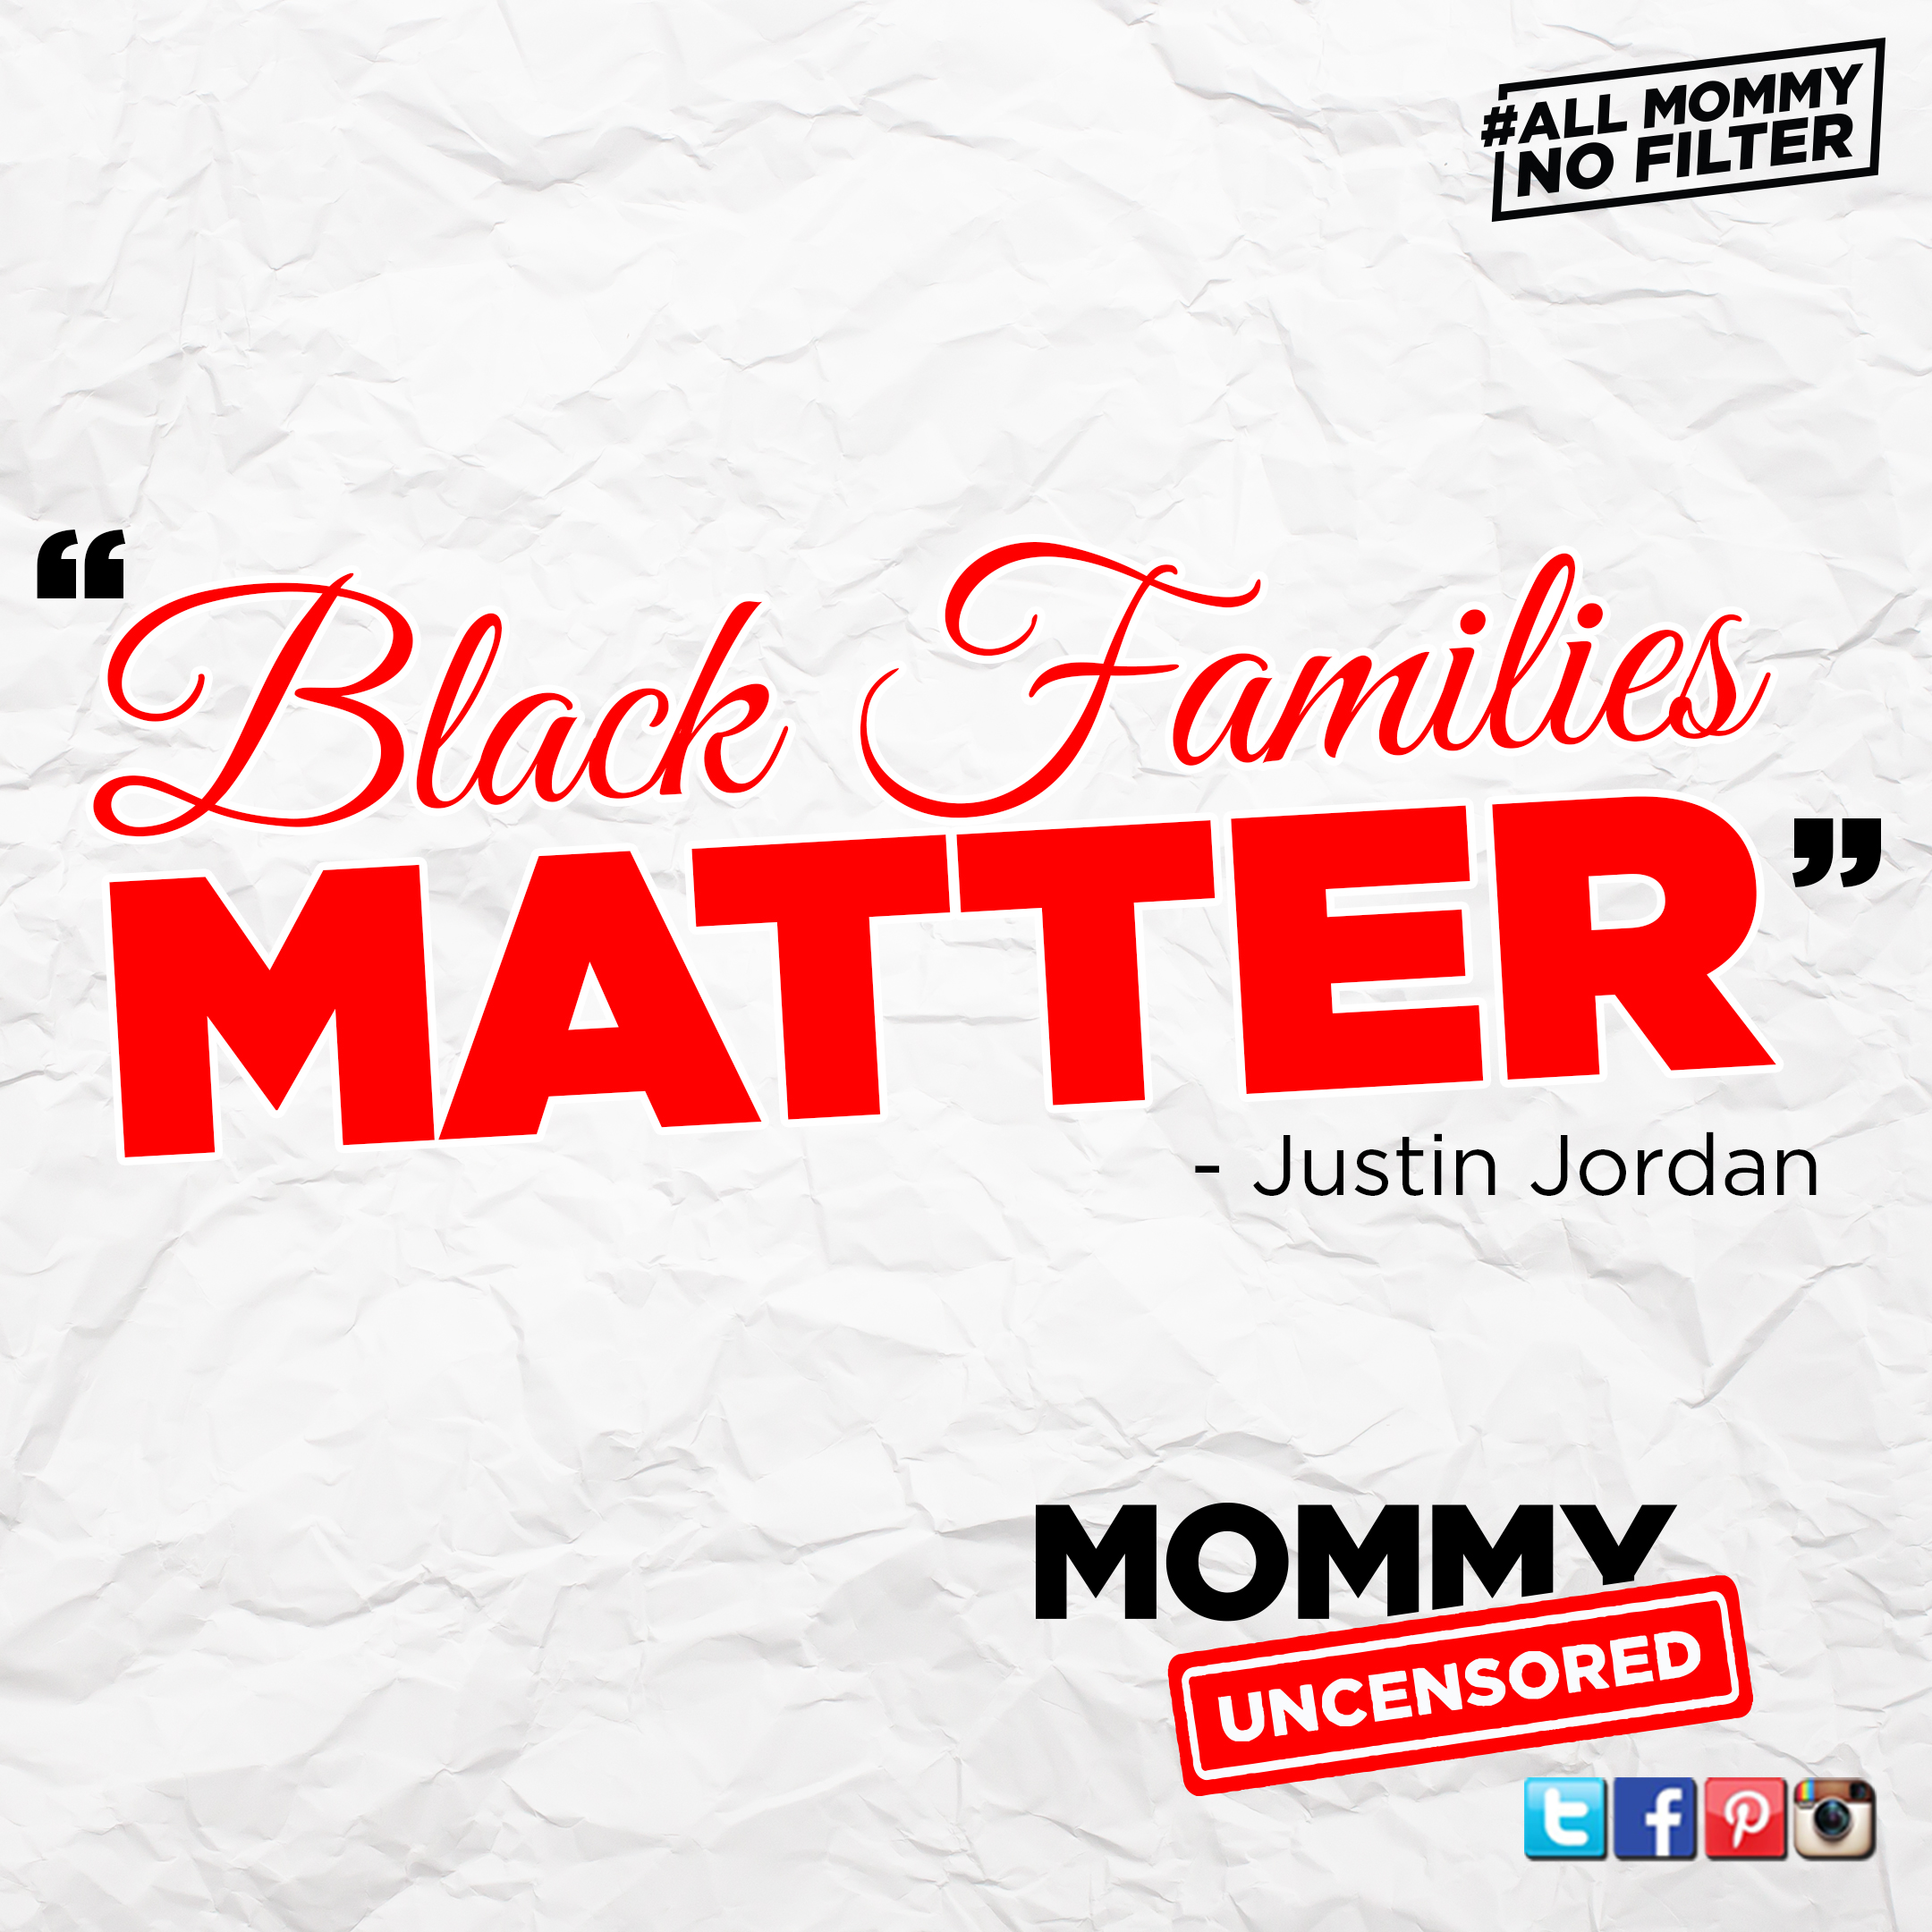 Black-Families-Matter---MU-Quote